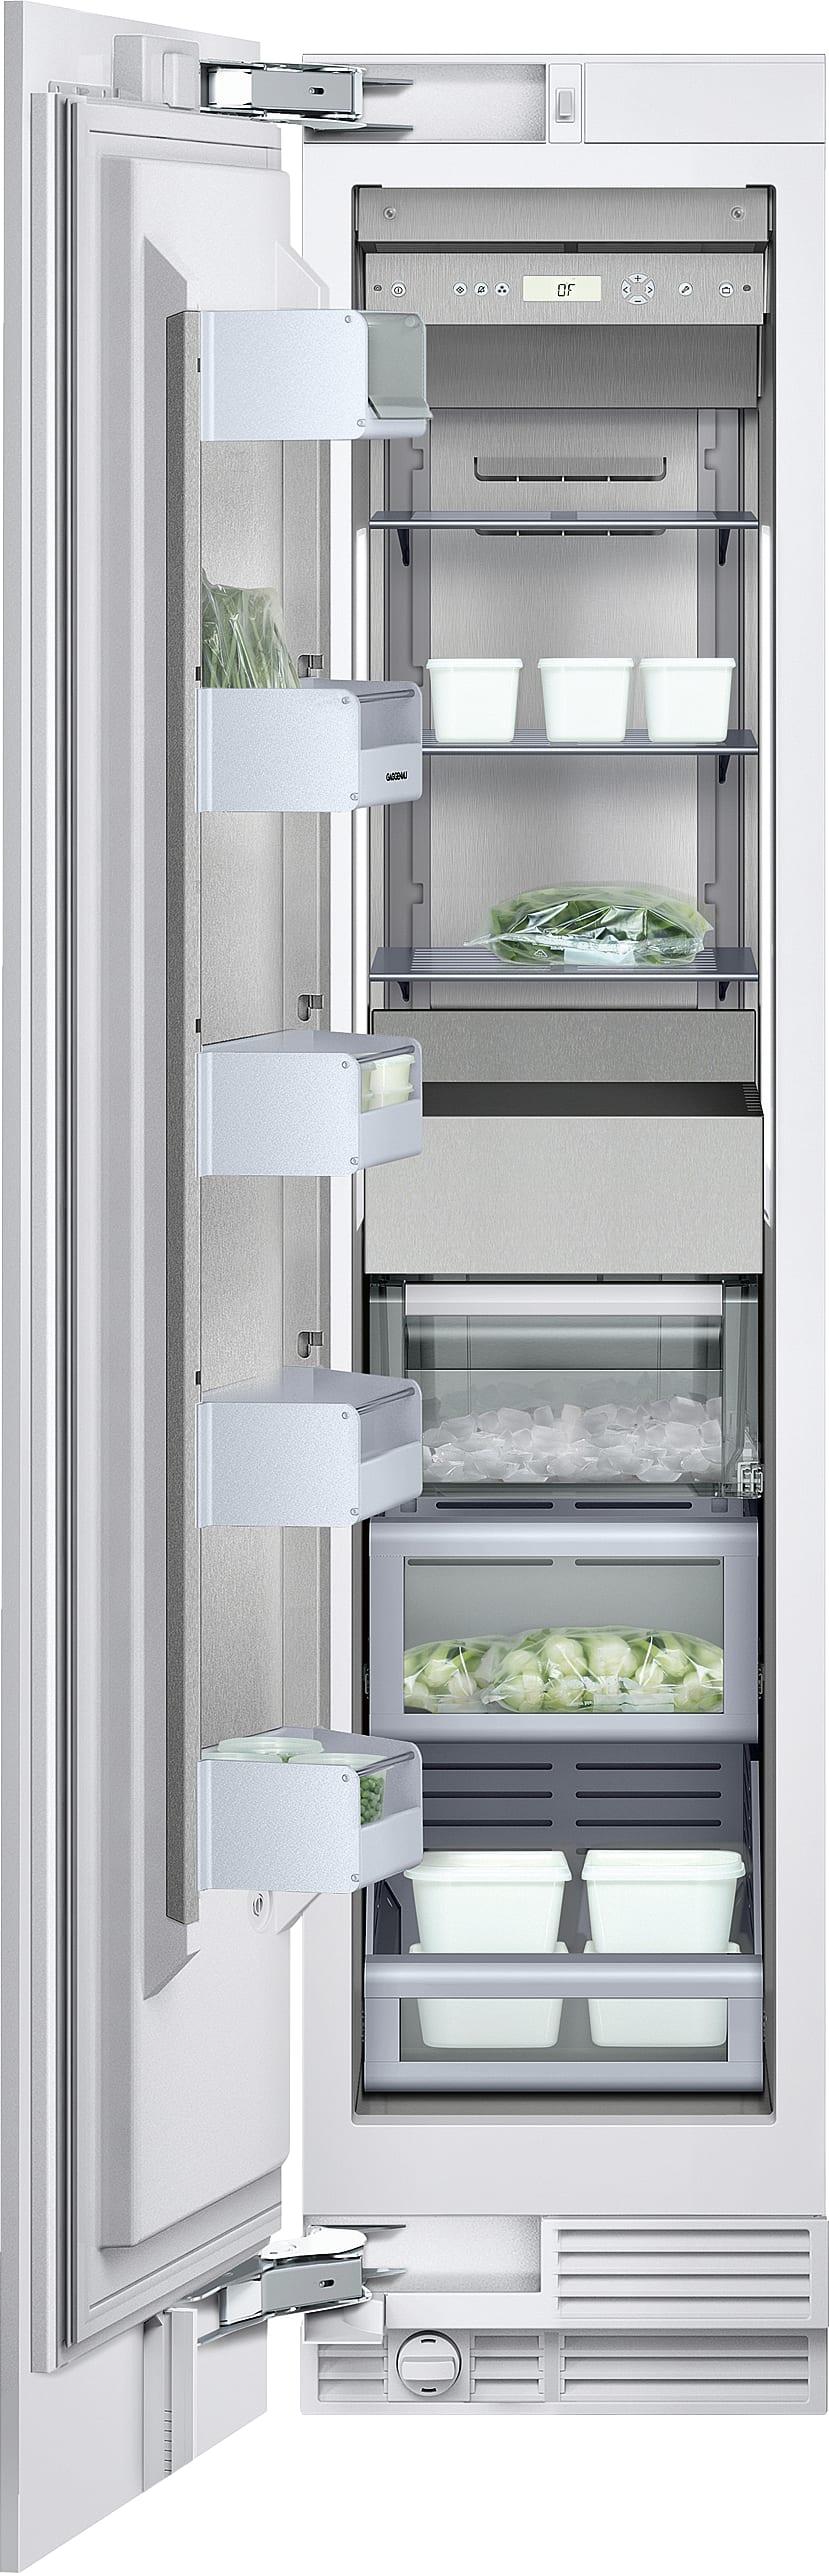 Gaggenau Rf411701 18 Inch All Freezer With Automatic Ice